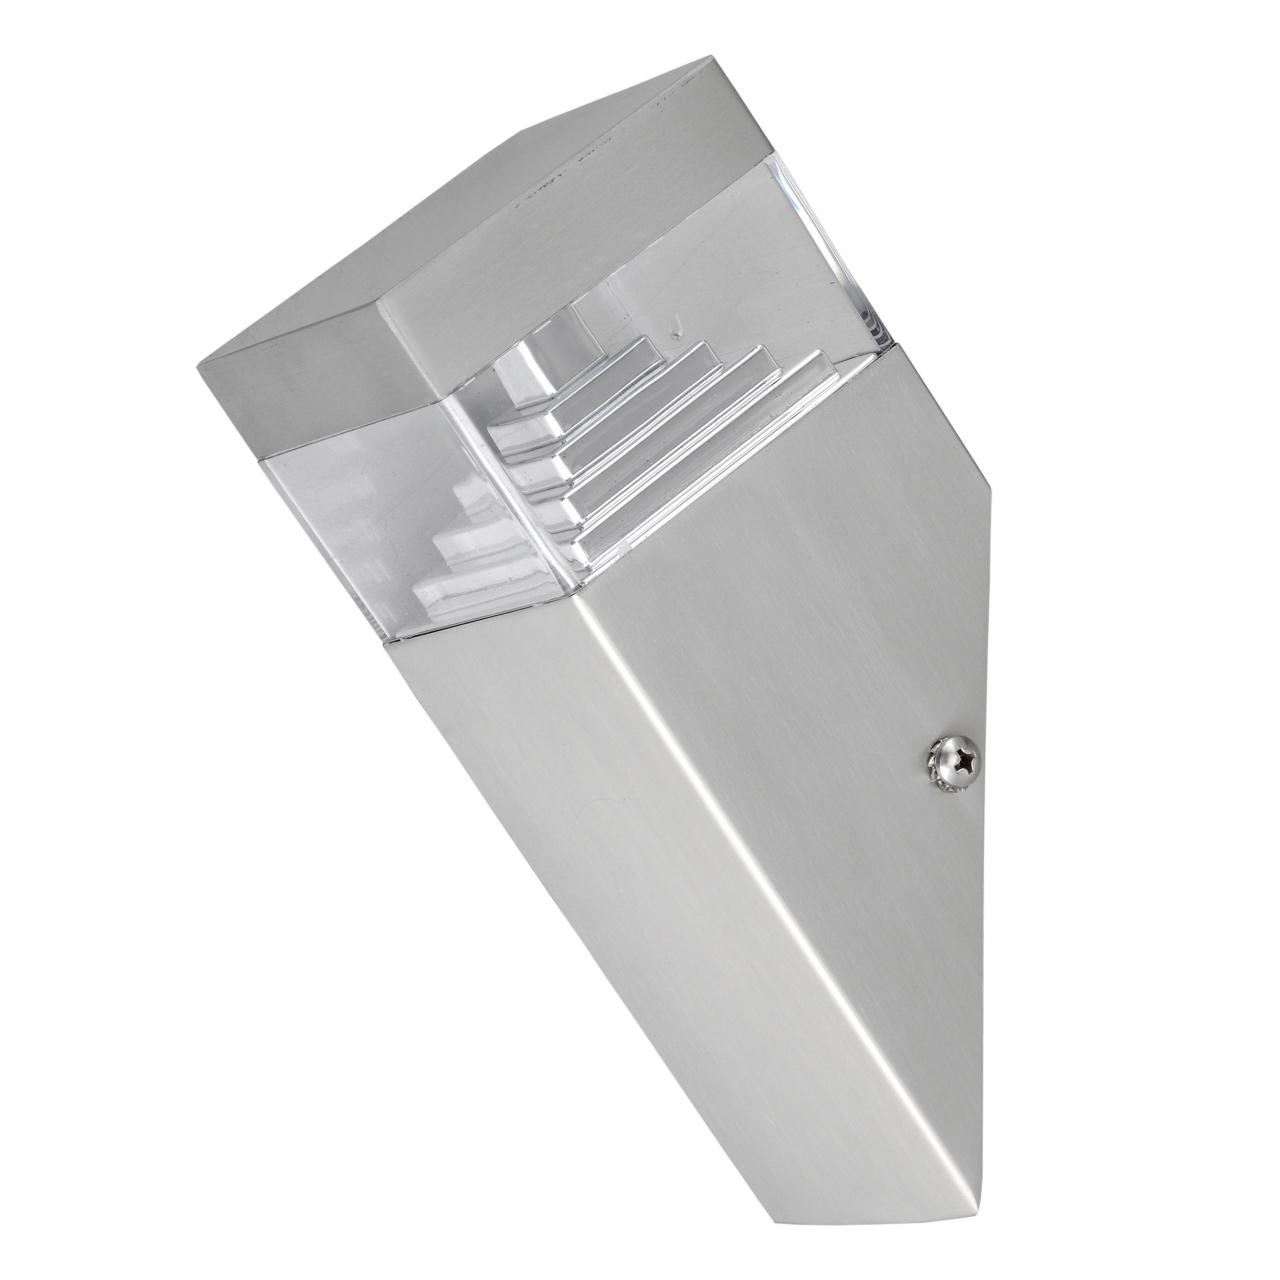 Светильник Raggio LED 6W 300LM алюминий 4000K IP55 Lightstar 377605